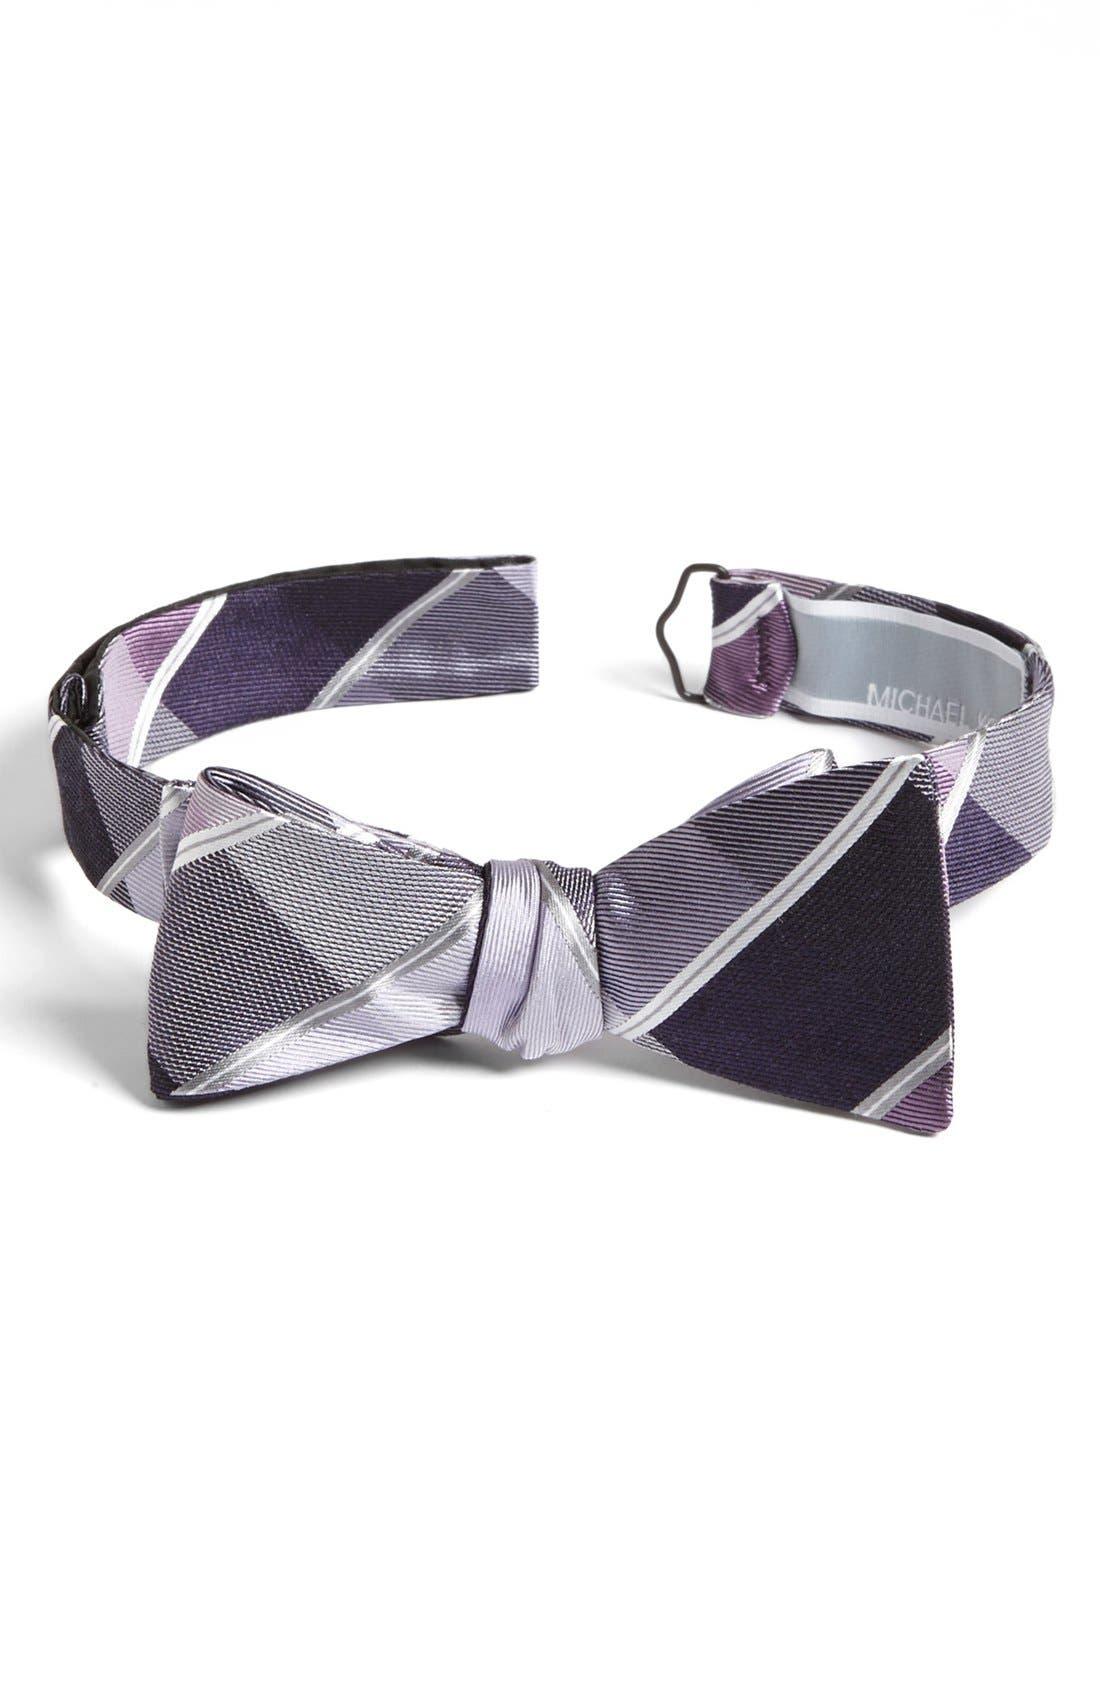 Main Image - Michael Kors Silk Bow Tie